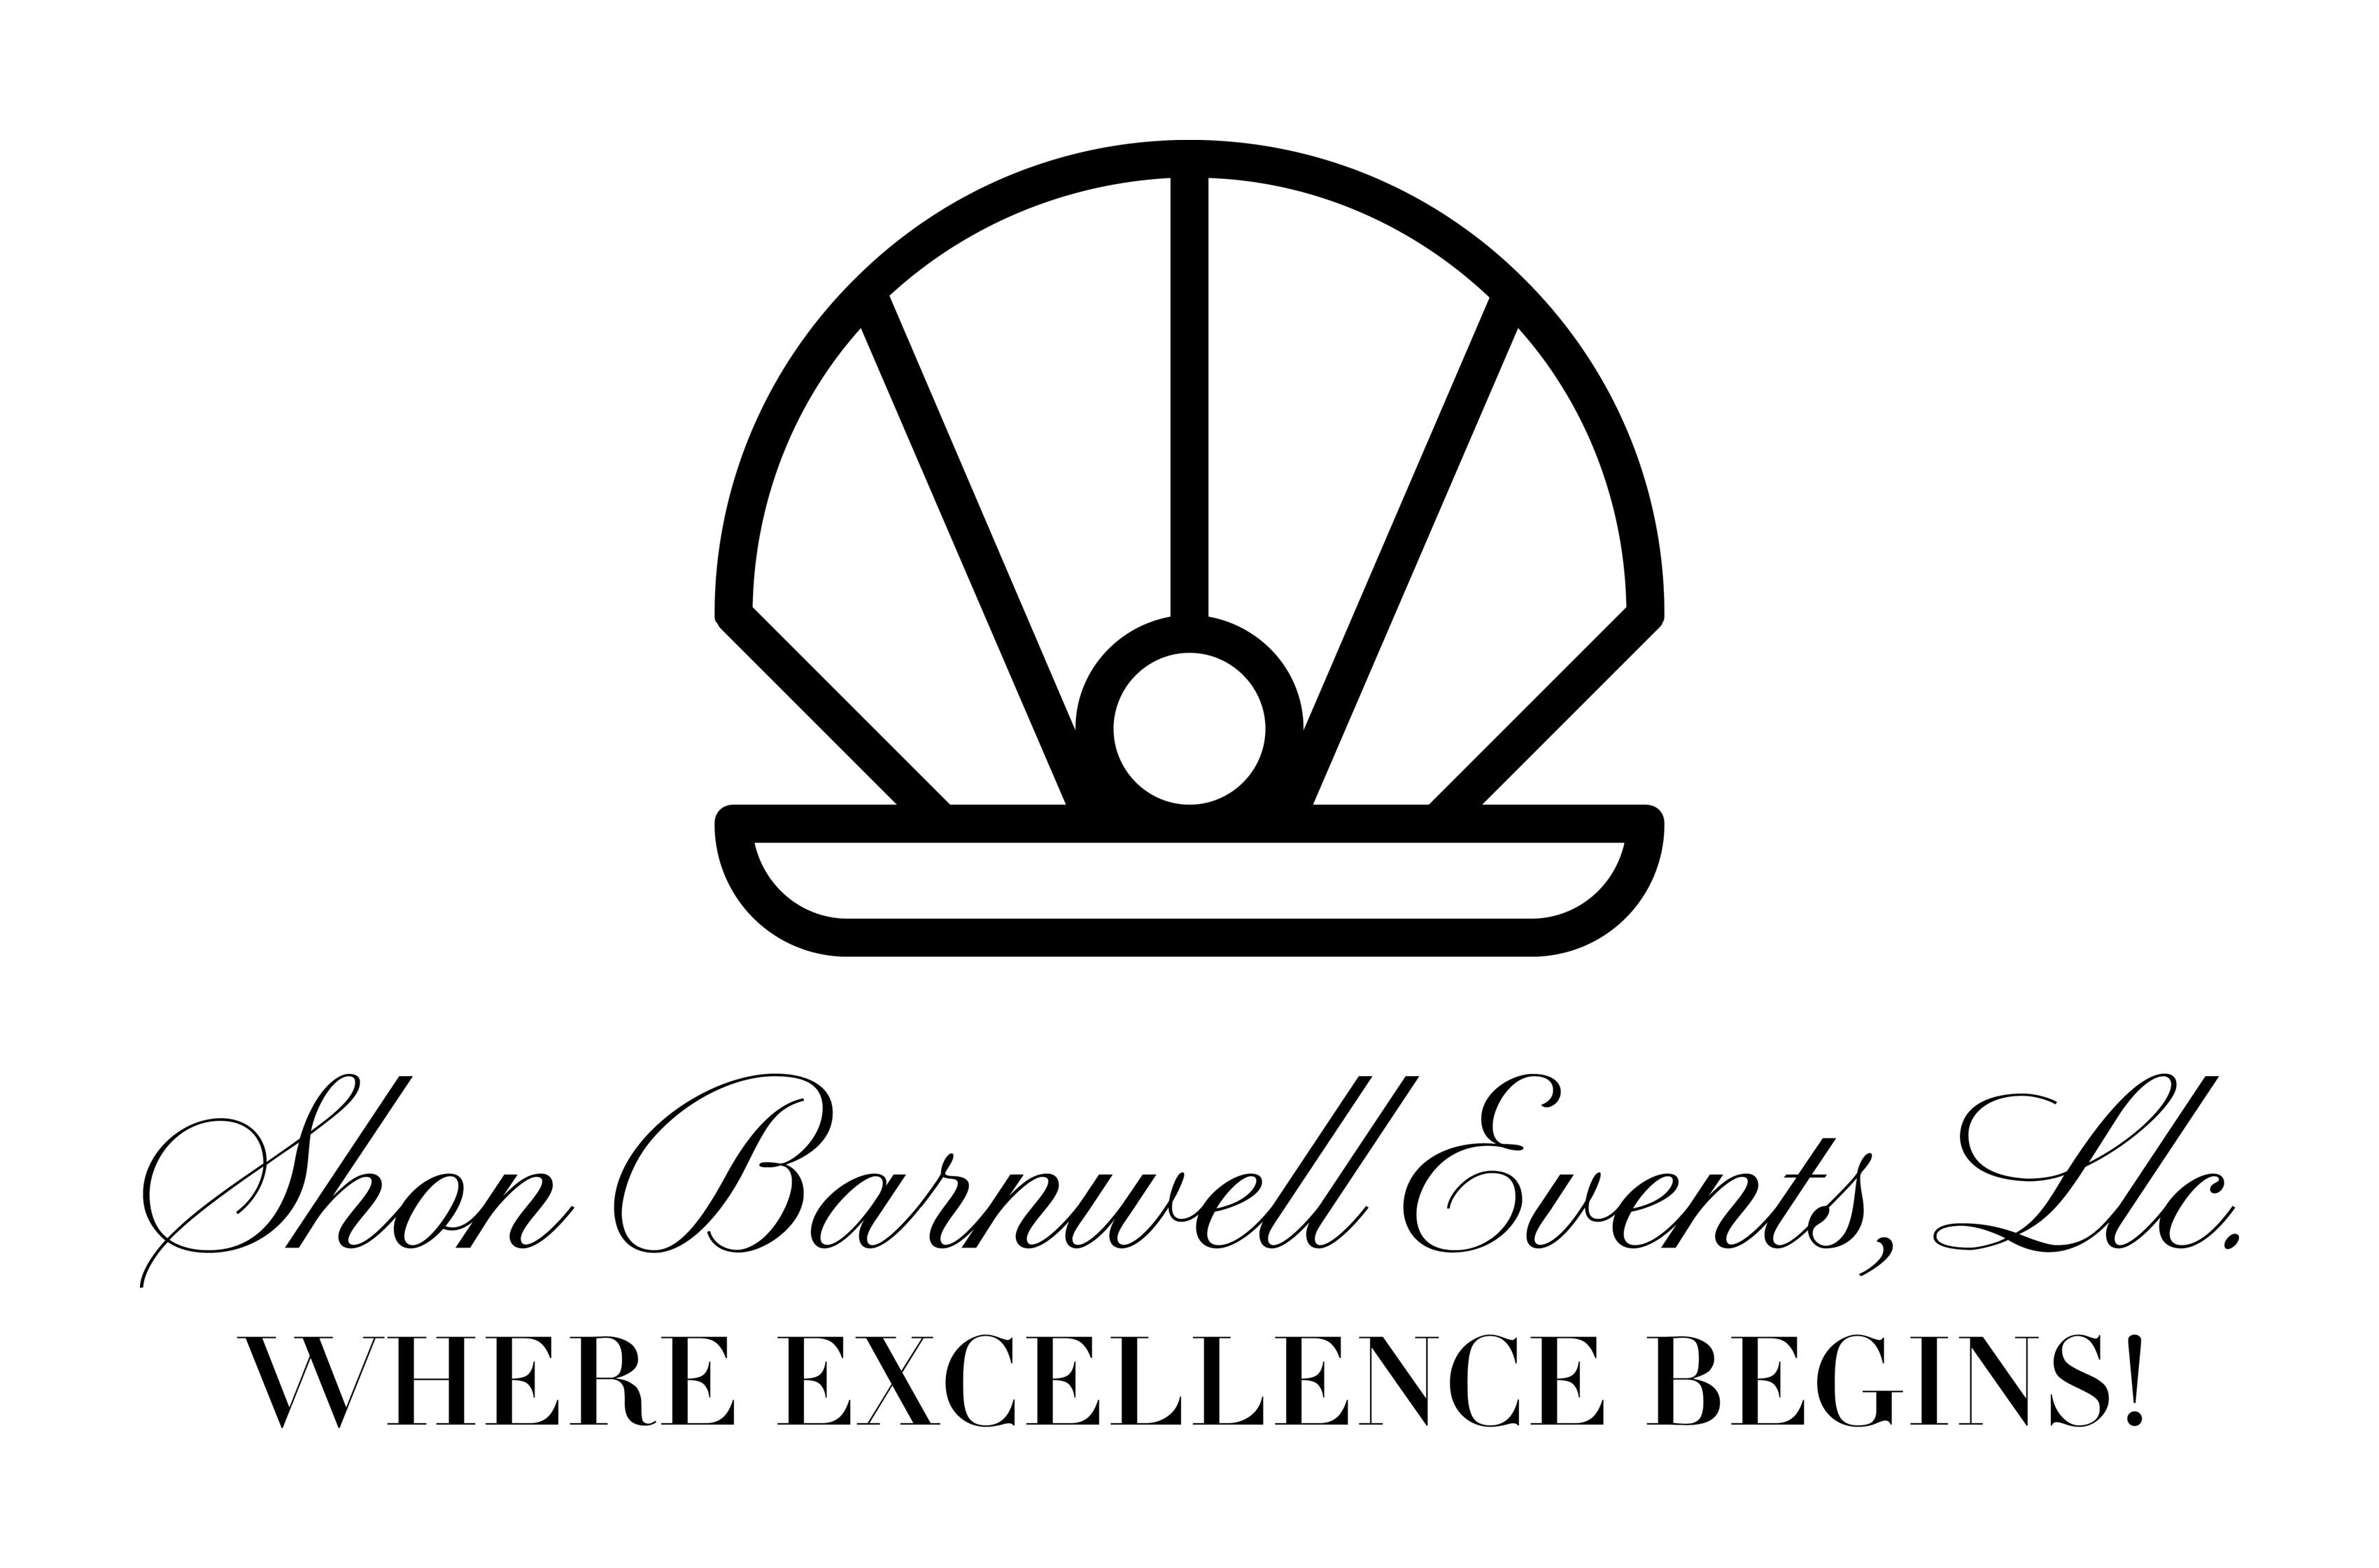 News Timeline - Shon Barnwell Events